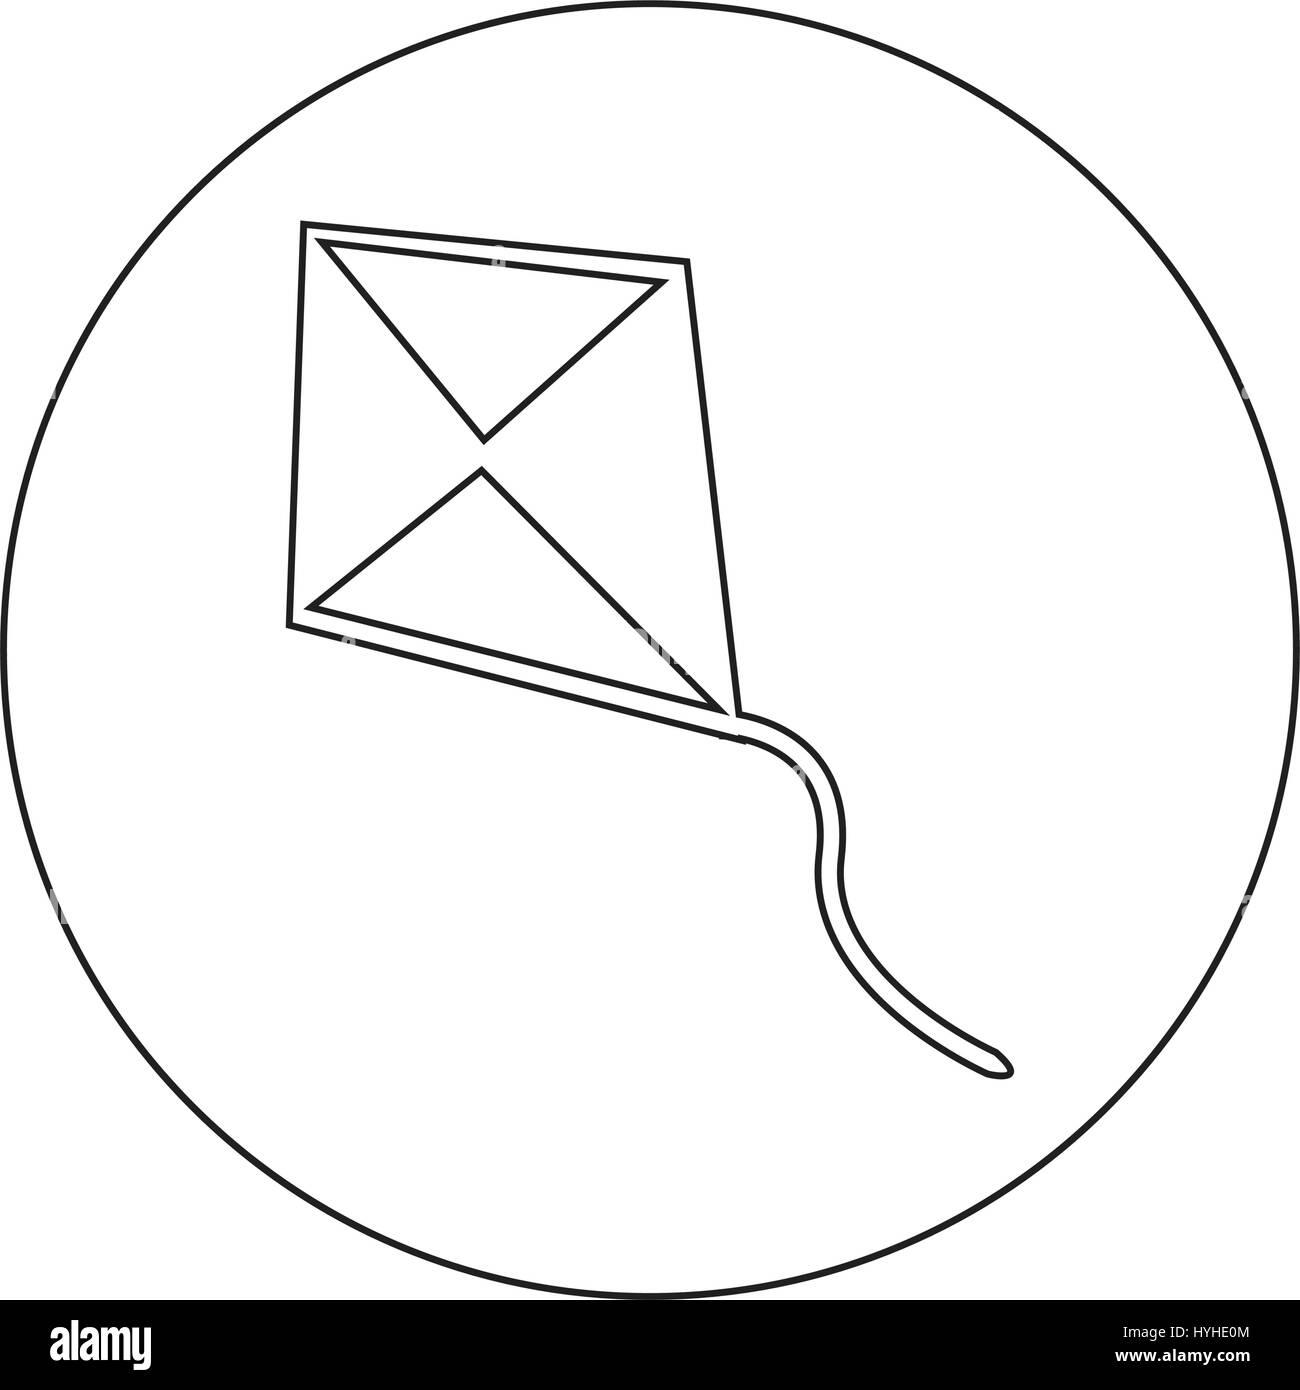 Kite Cartoon Icon Black And White Stock Photos Images Alamy Diagram Image